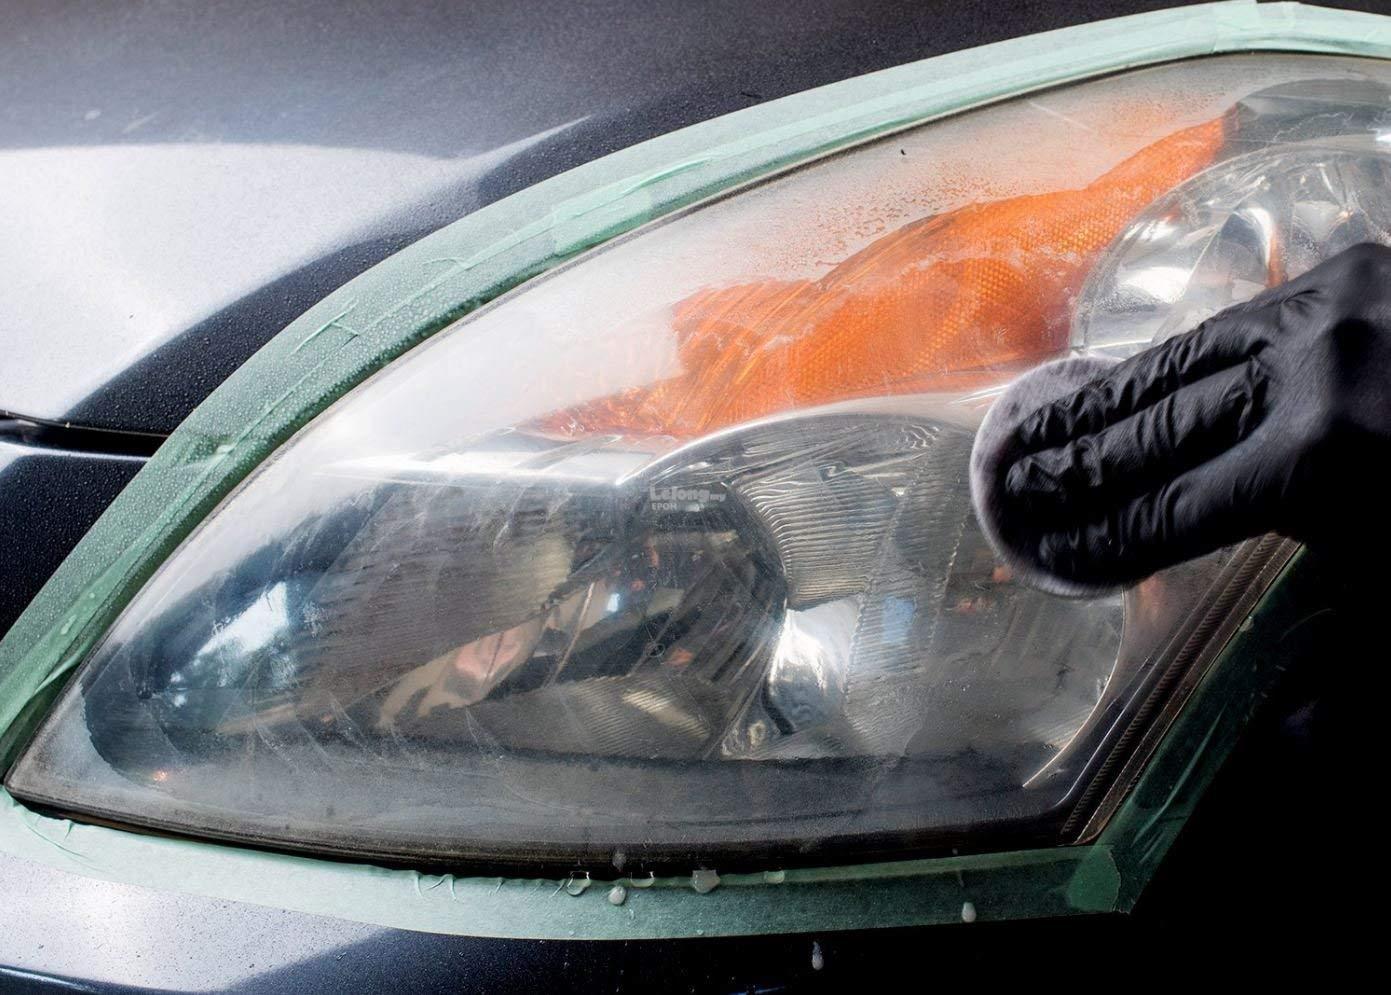 39186 3M QUICK HEADLIGHT RENEWAL, CAR HEADLAMP RESTORE CLEANER LIGHT